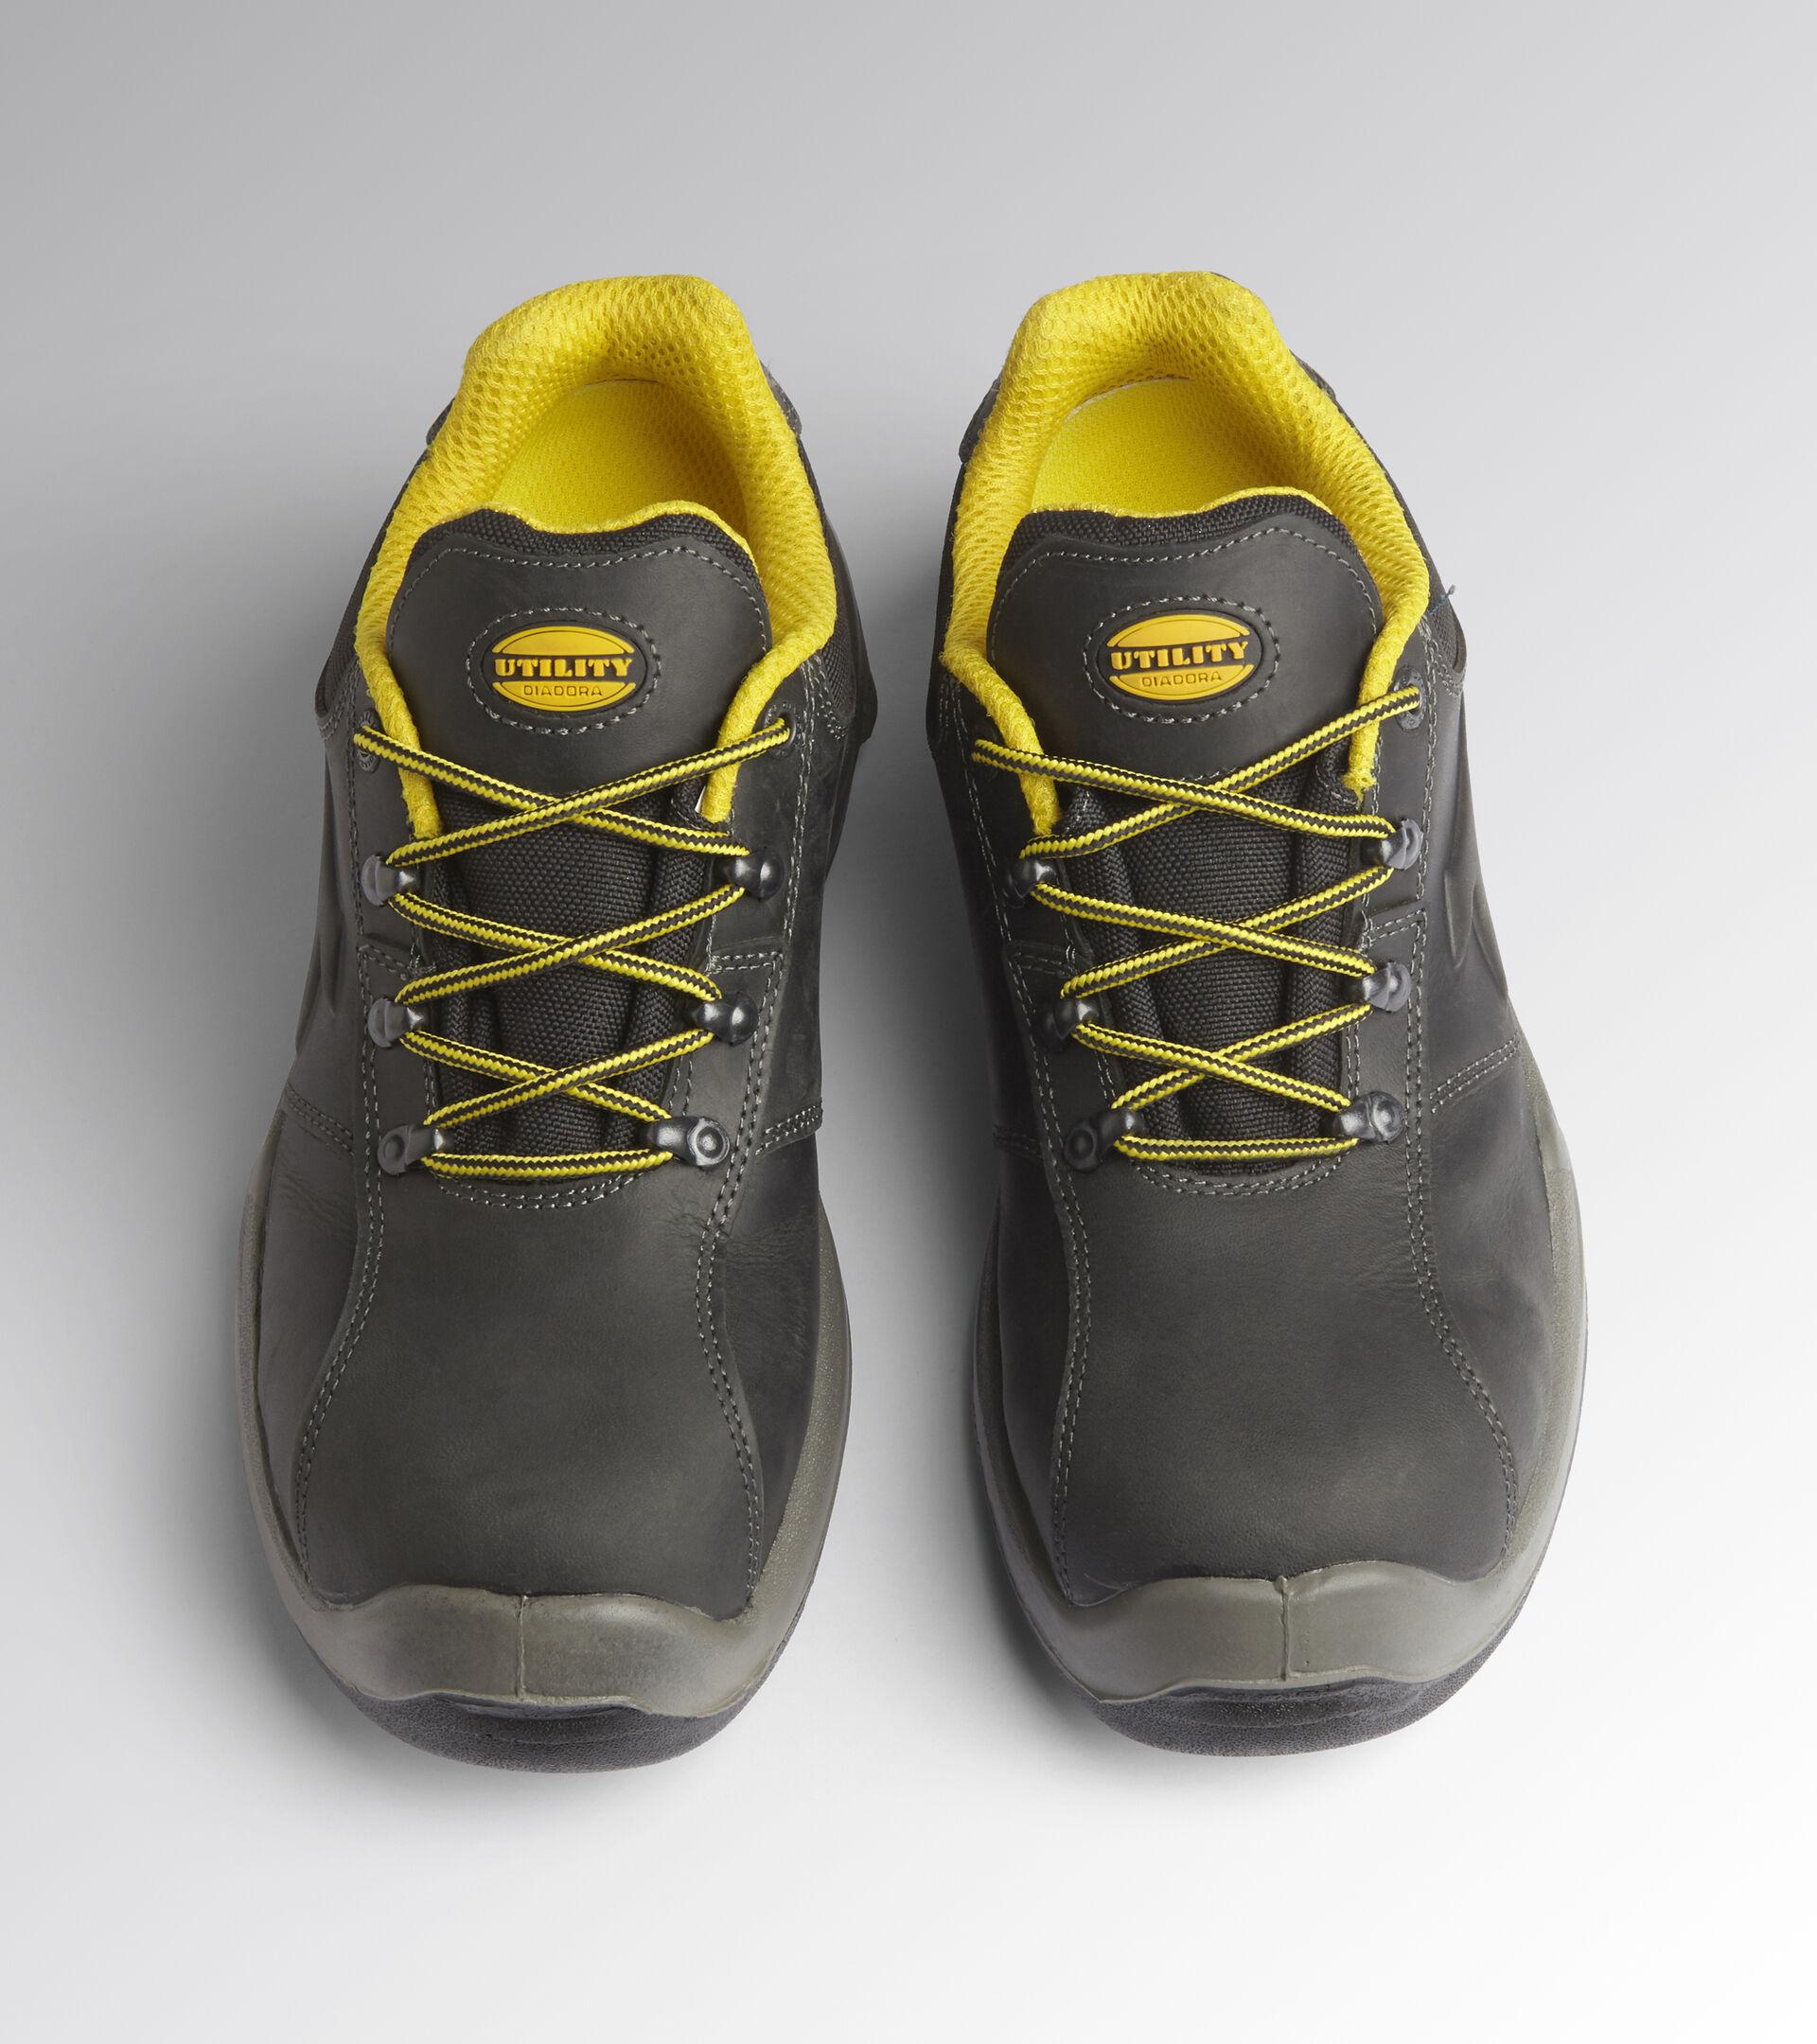 Footwear Utility UNISEX FLOW LOW S3 SRC SCHWARZ Utility